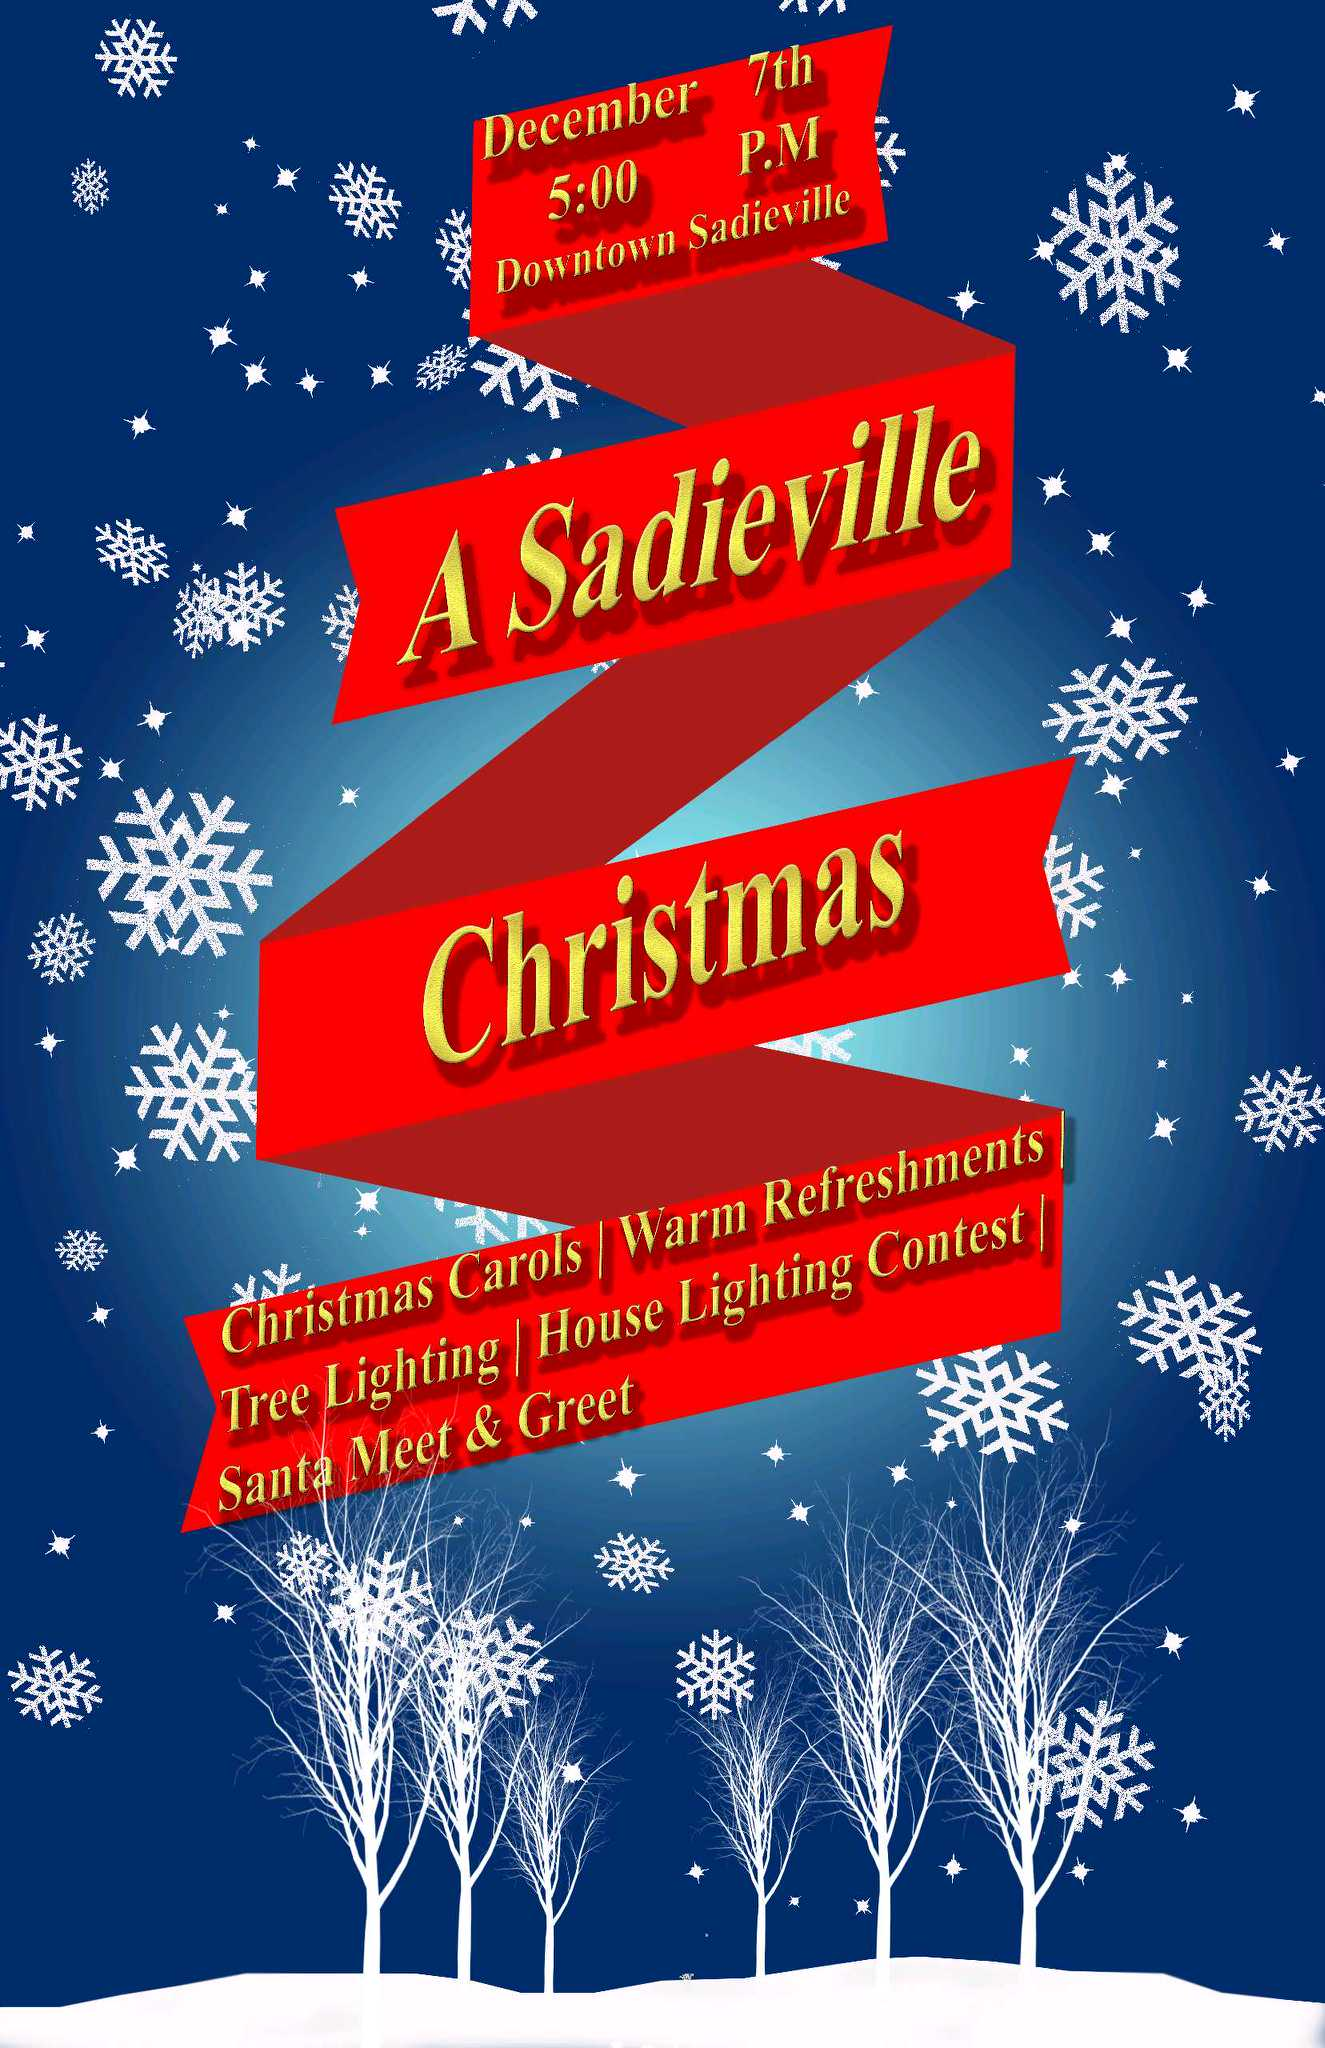 A Sadieville Christmas